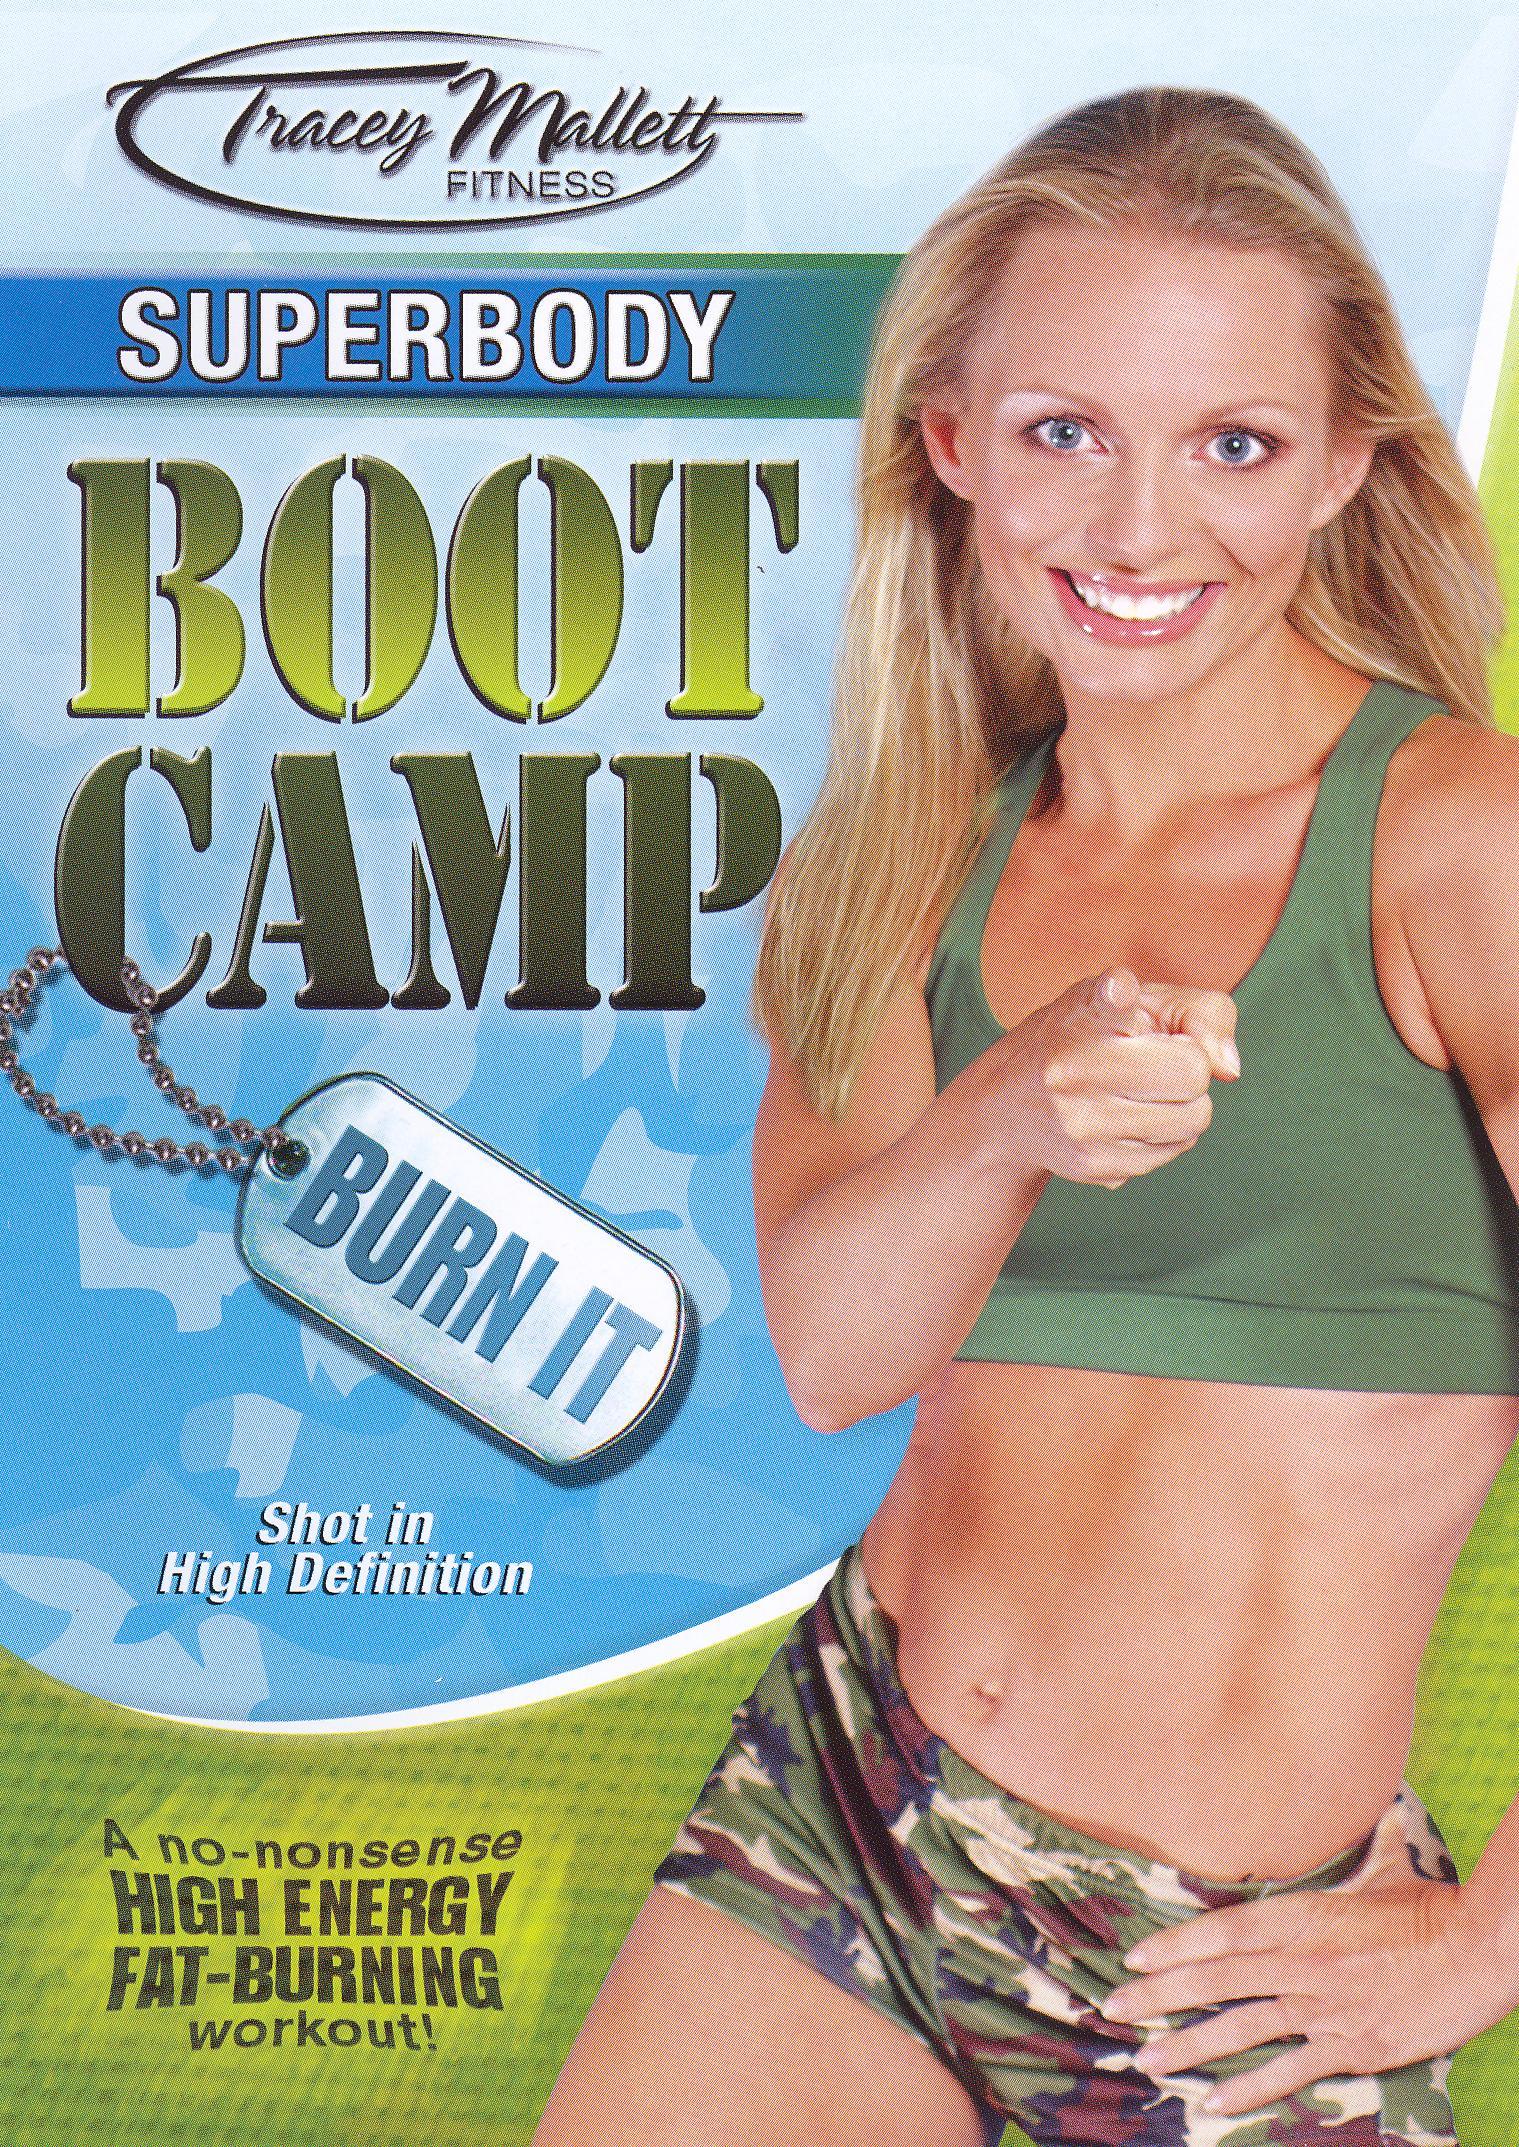 Superbody Boot Camp: Burn It